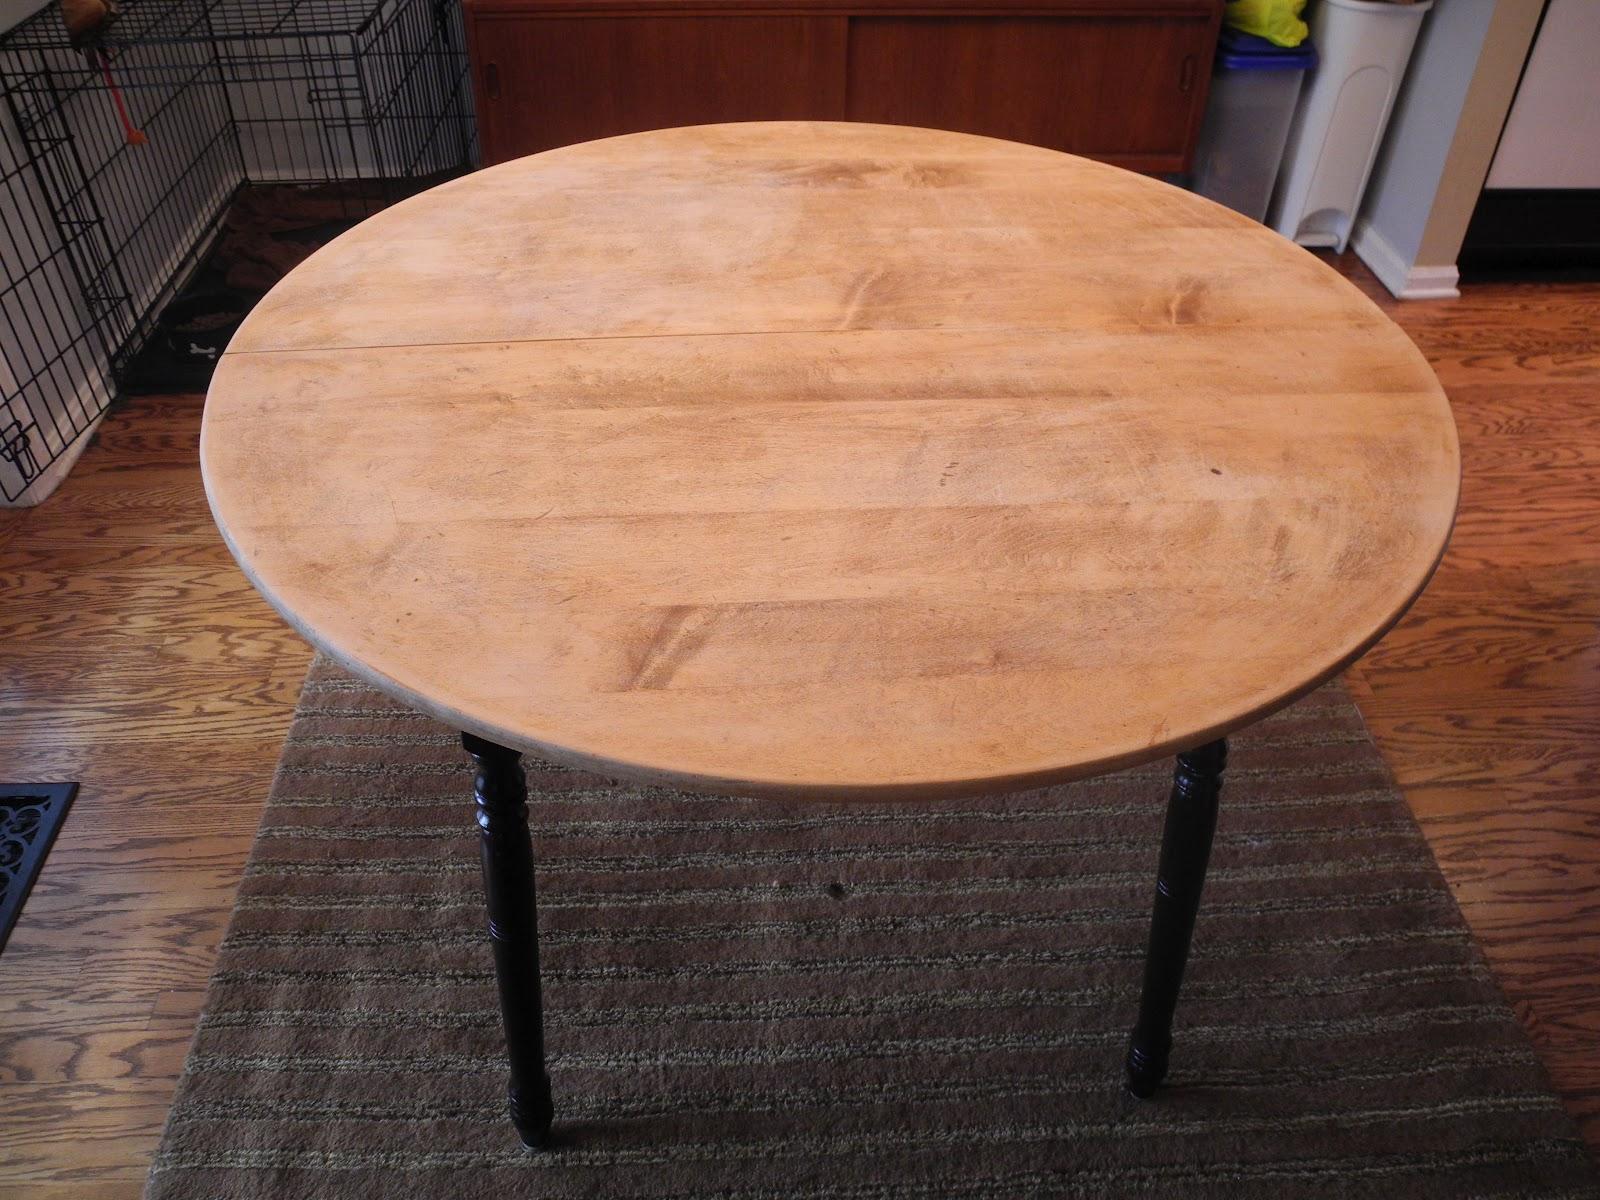 Refinishing Wood Kitchen Table